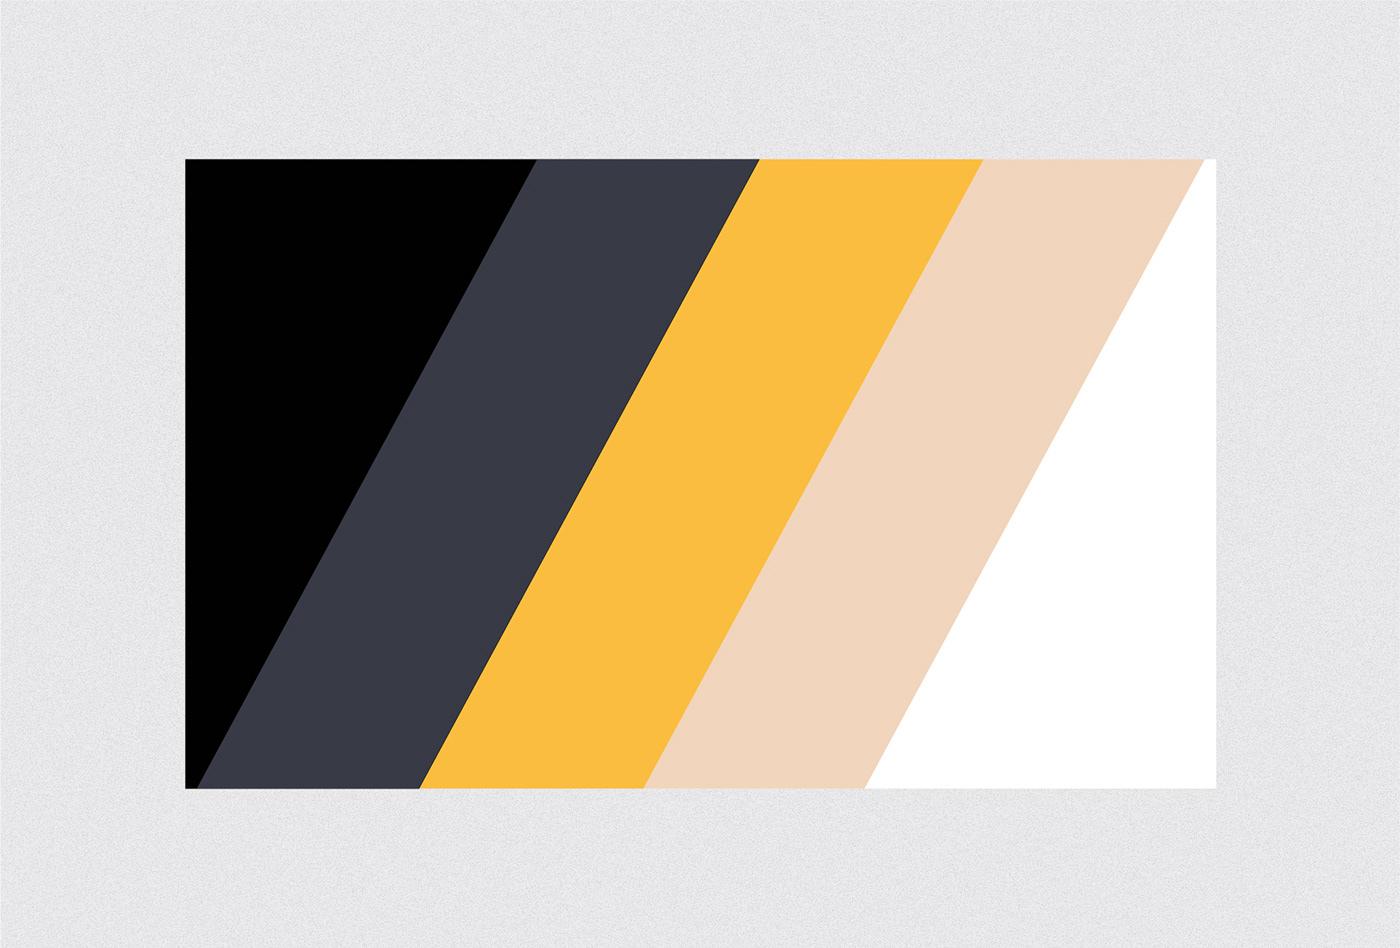 logo,branding ,Beer Pub,craft beer,brand book,identity,Logotype,restaurant,bar,Draft